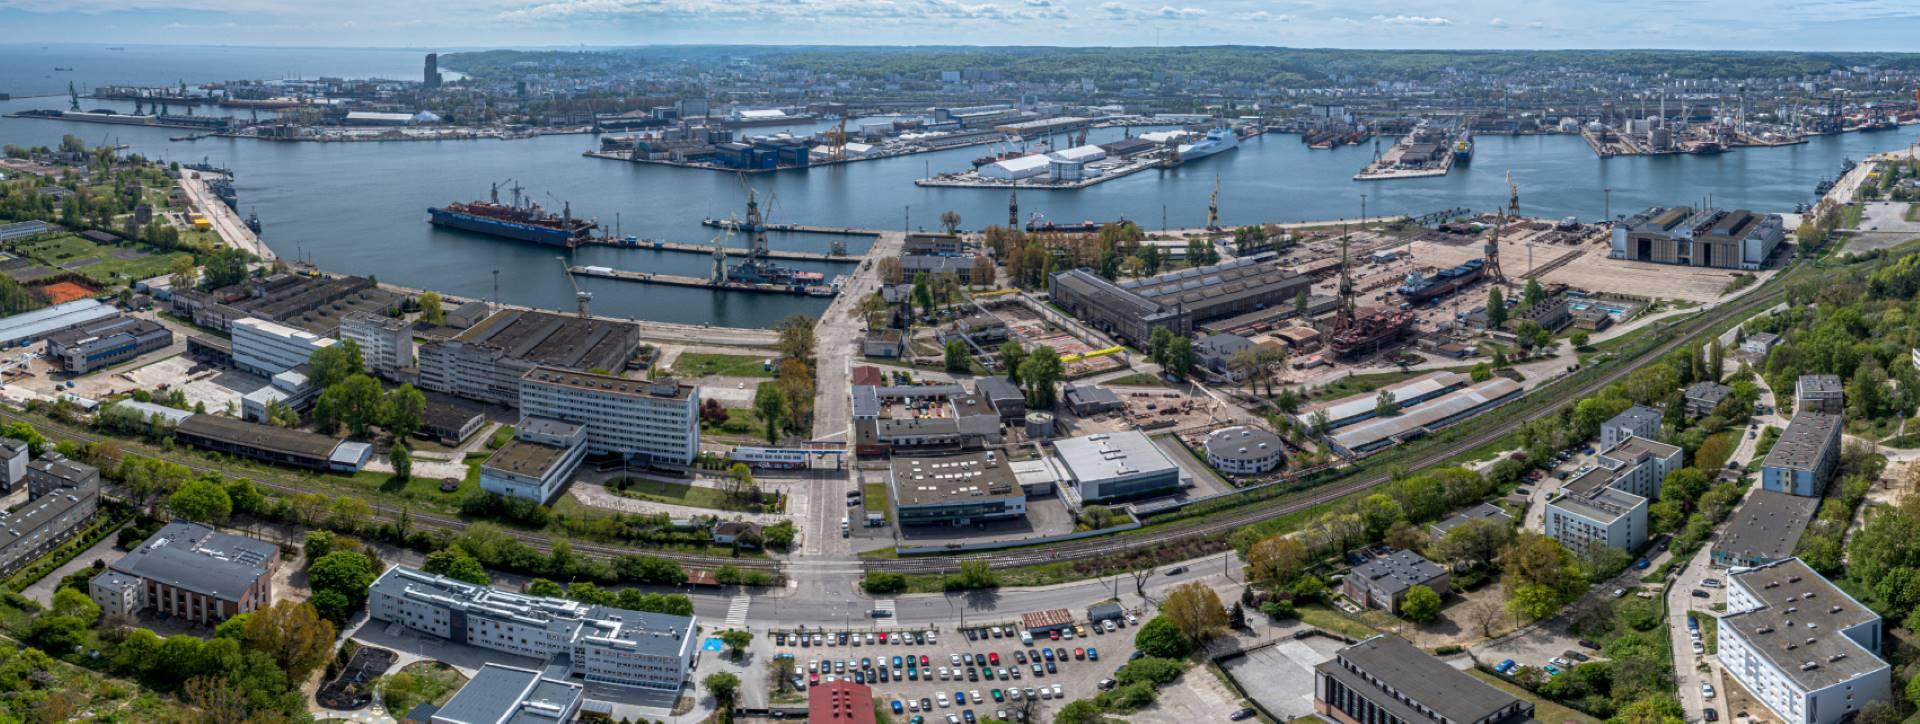 SENER Marine signs a FORAN contract with PGZ STOCZNIA WOJENNA